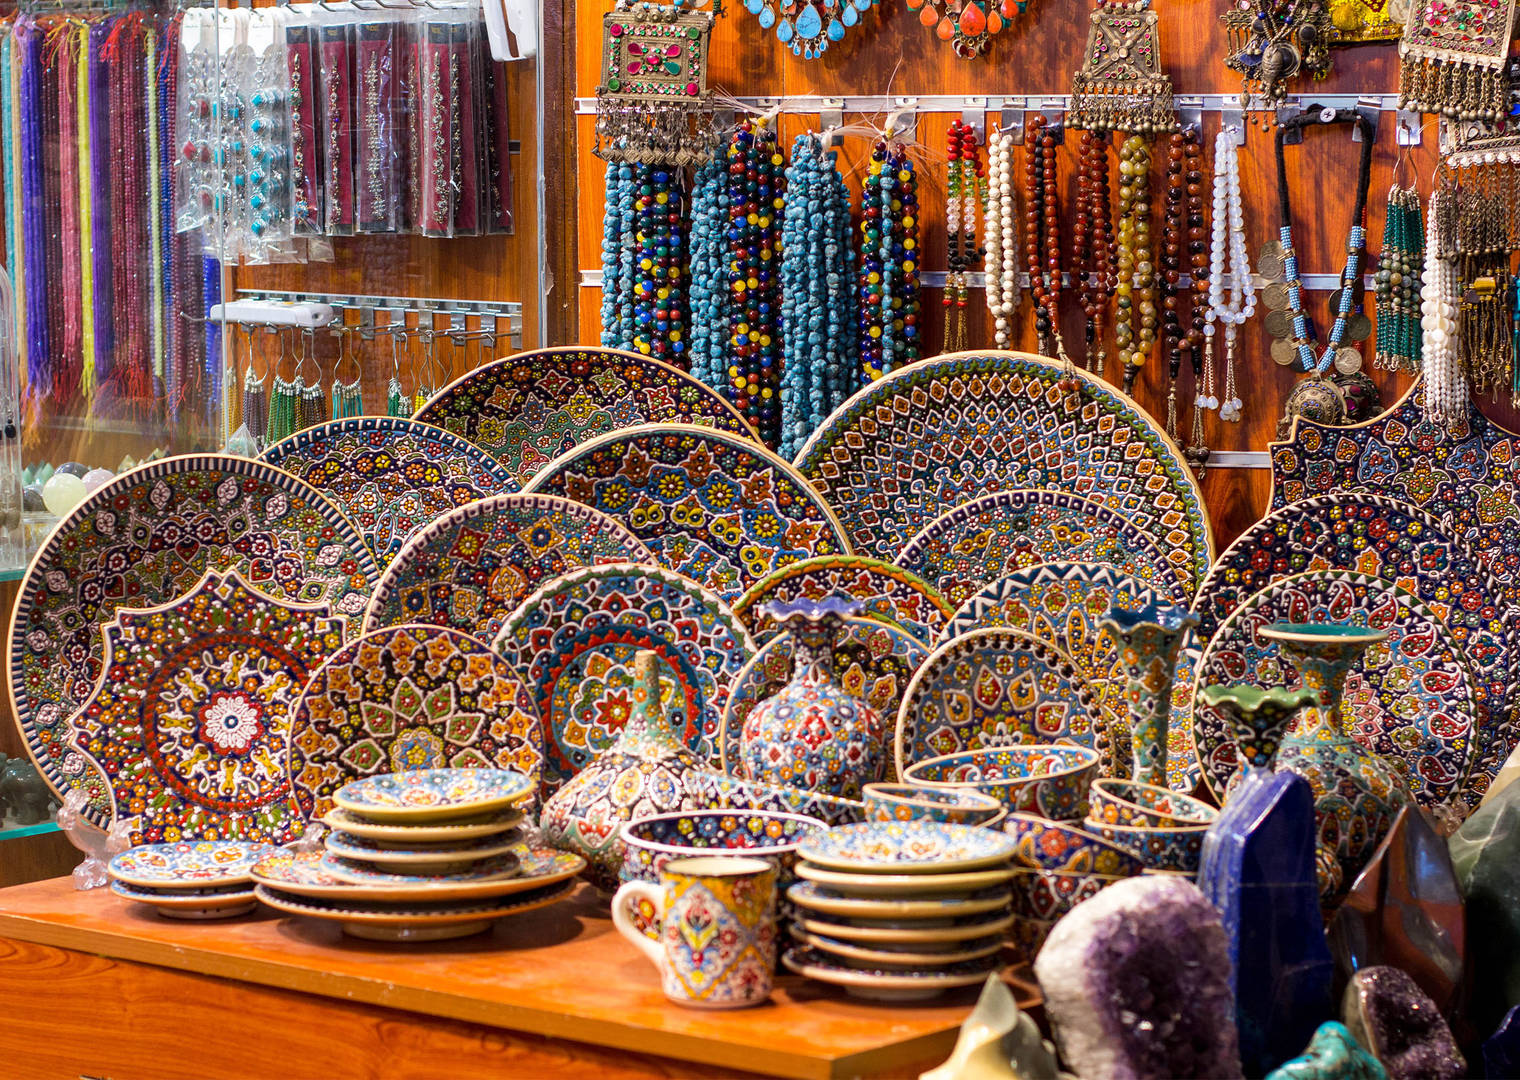 Souvenirs at global village